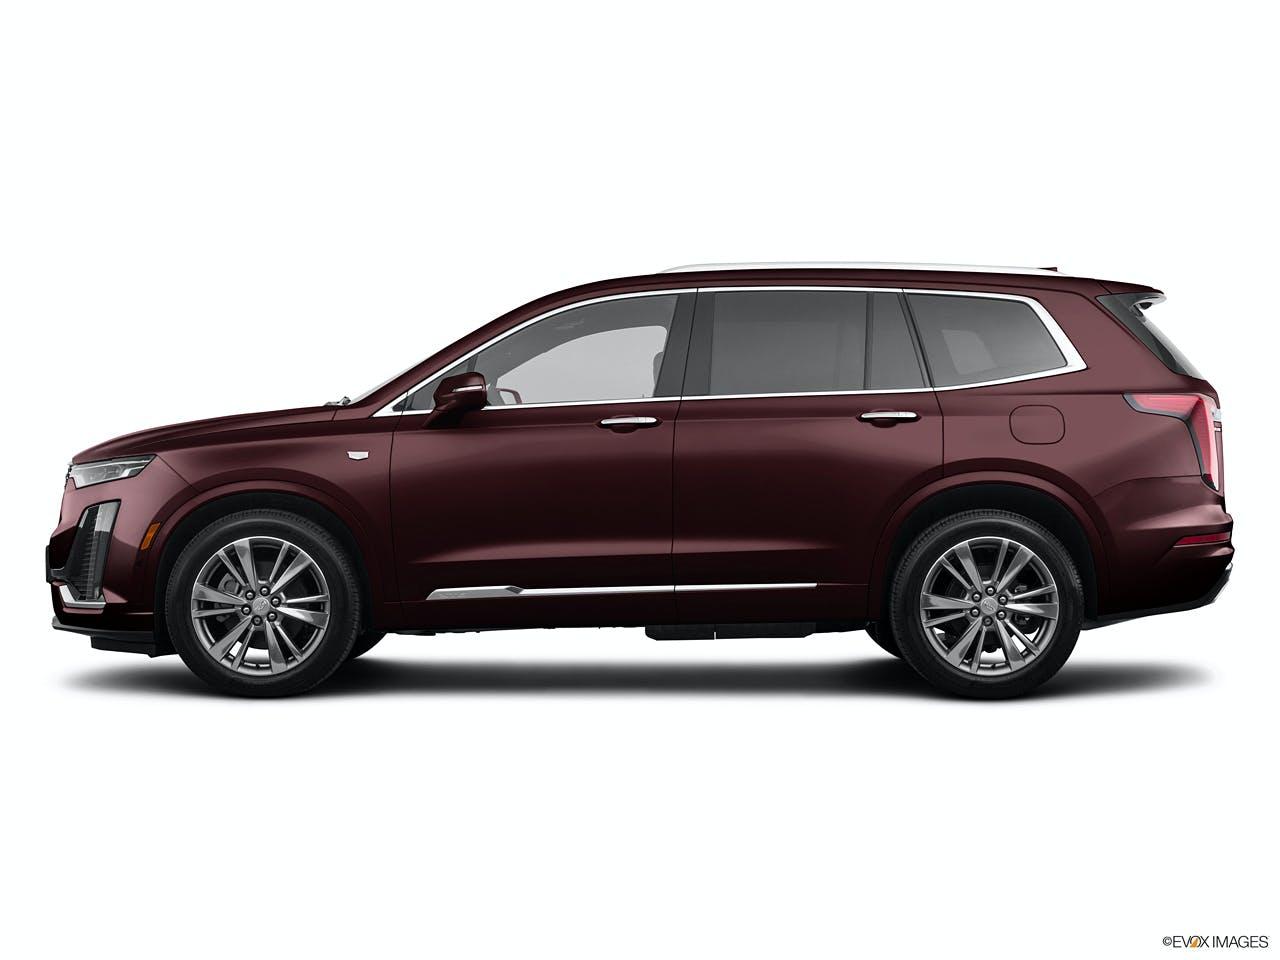 2020 Cadillac Xt6 Premium Luxury Cpl0014 Deliver My Ride